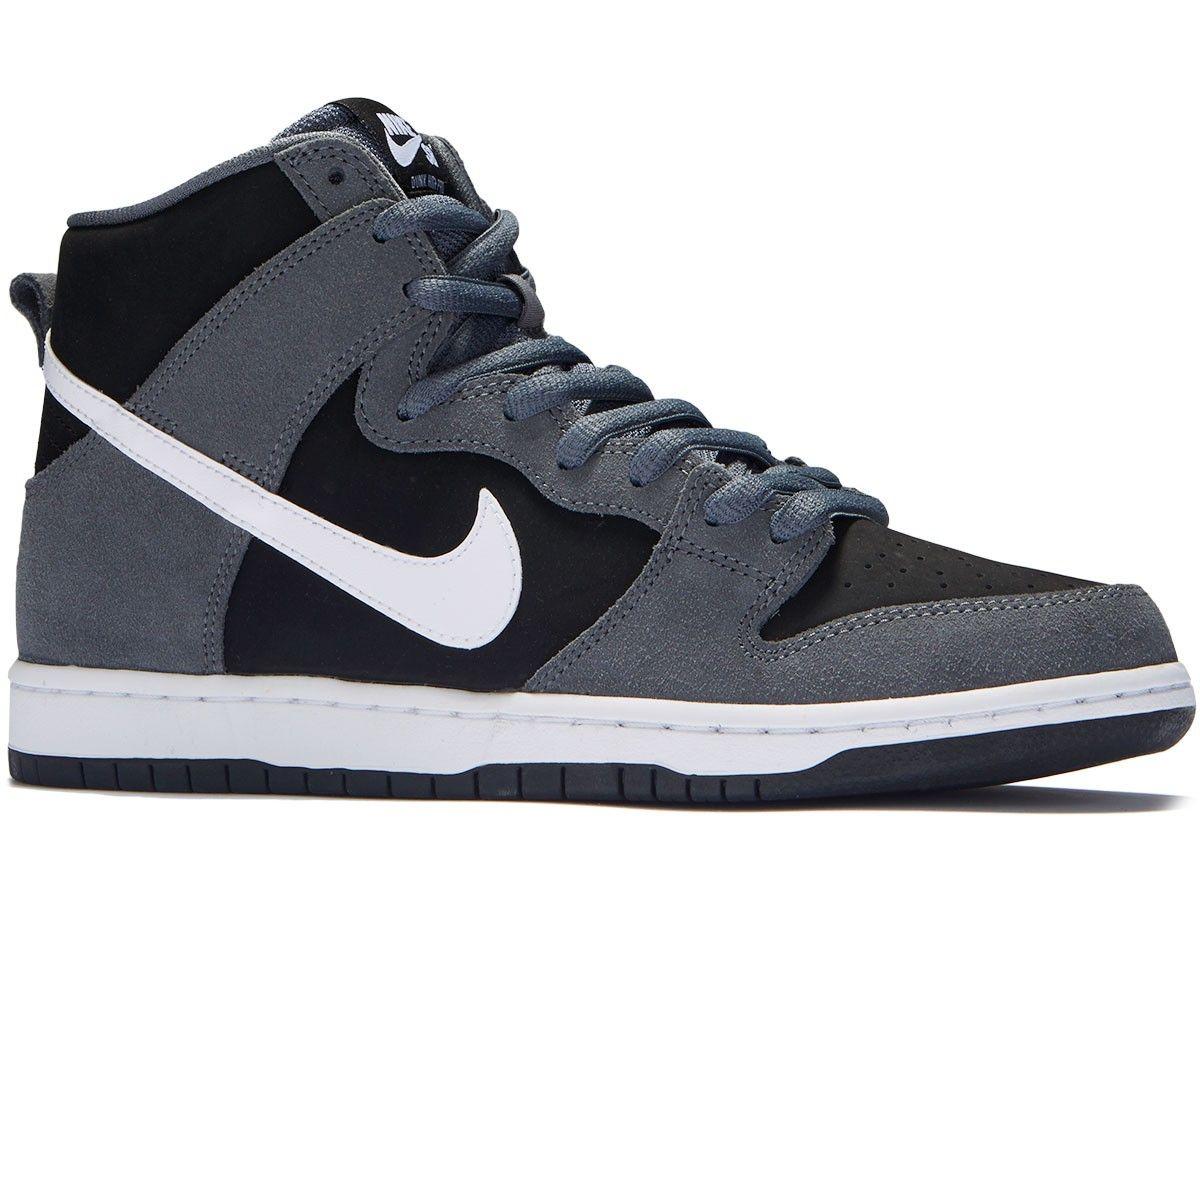 Nike Dunk High Pro SB Shoes - Dark Grey